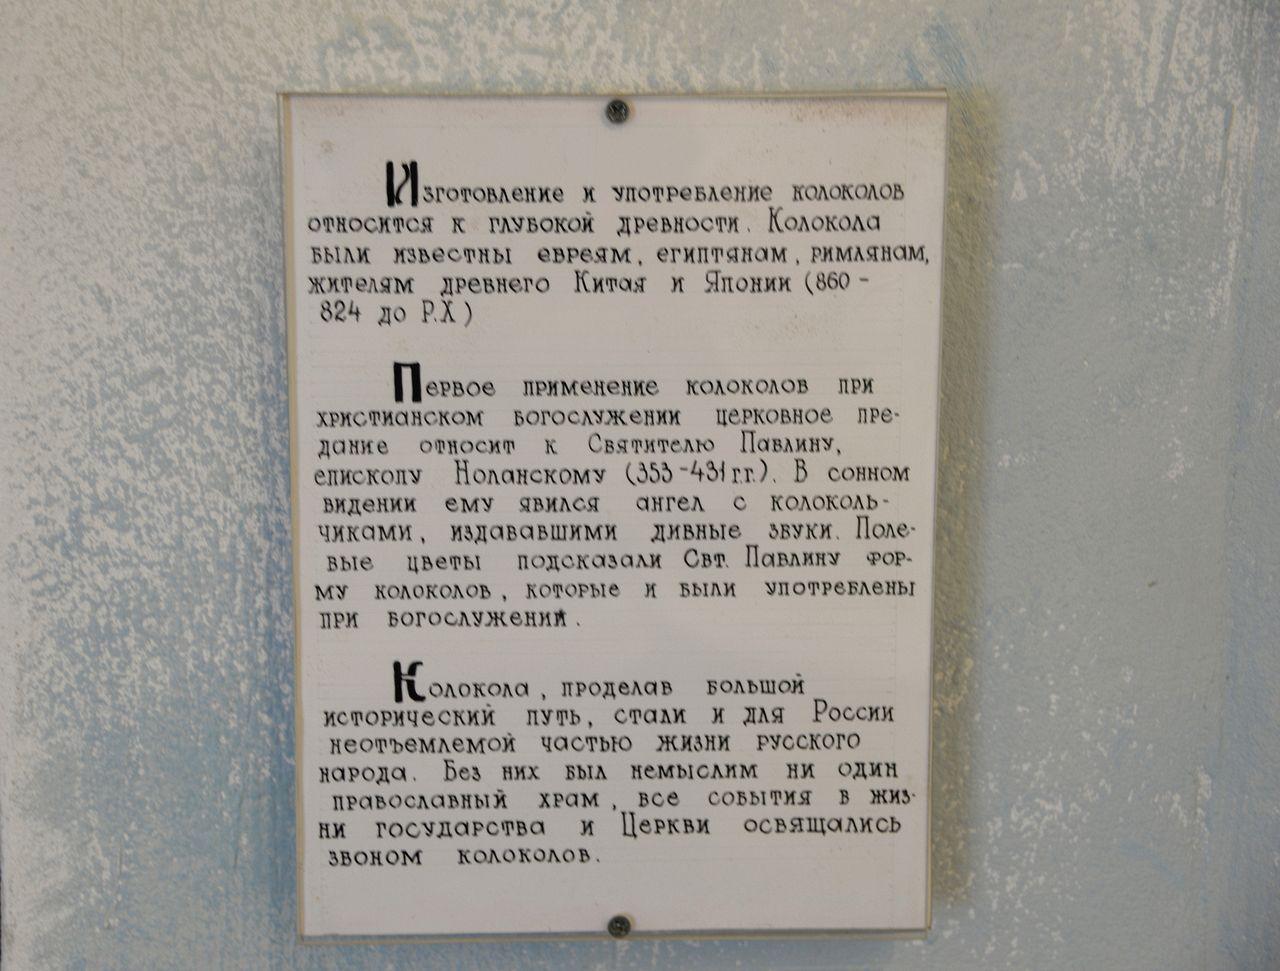 uriev_250515_edit_71_std.jpg